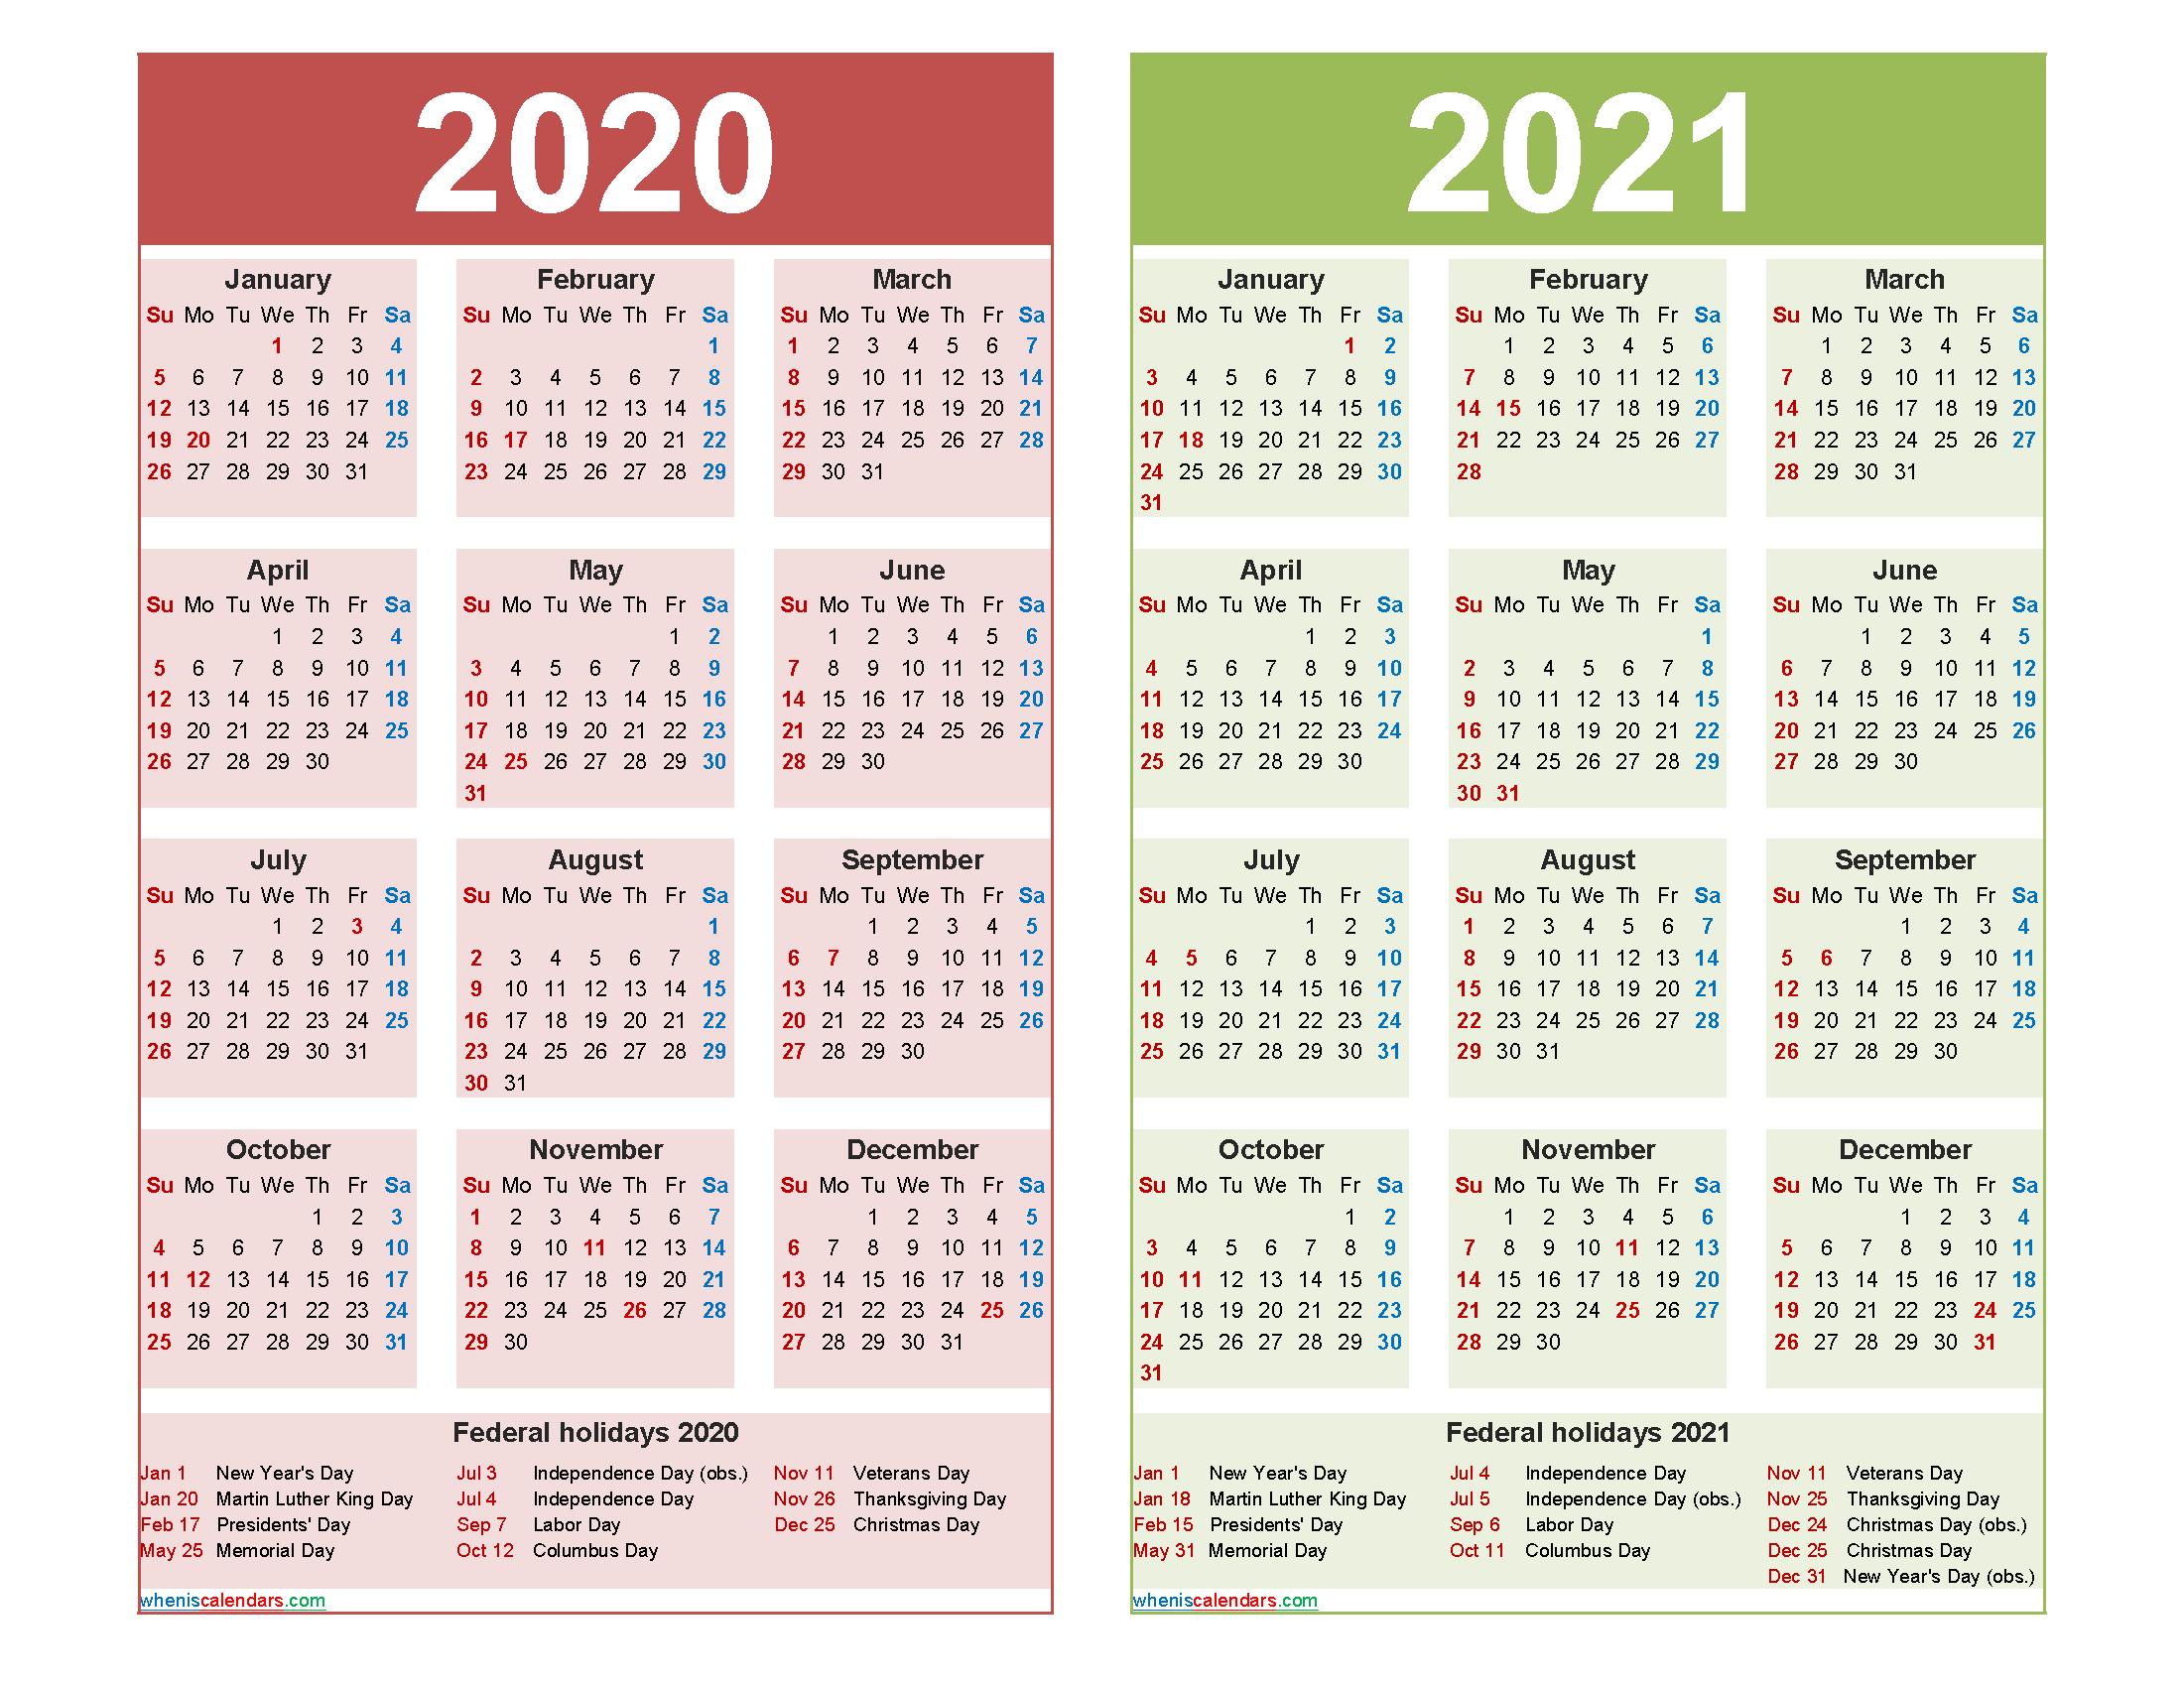 Free 2020 2021 Calendar Printable Word, PDF